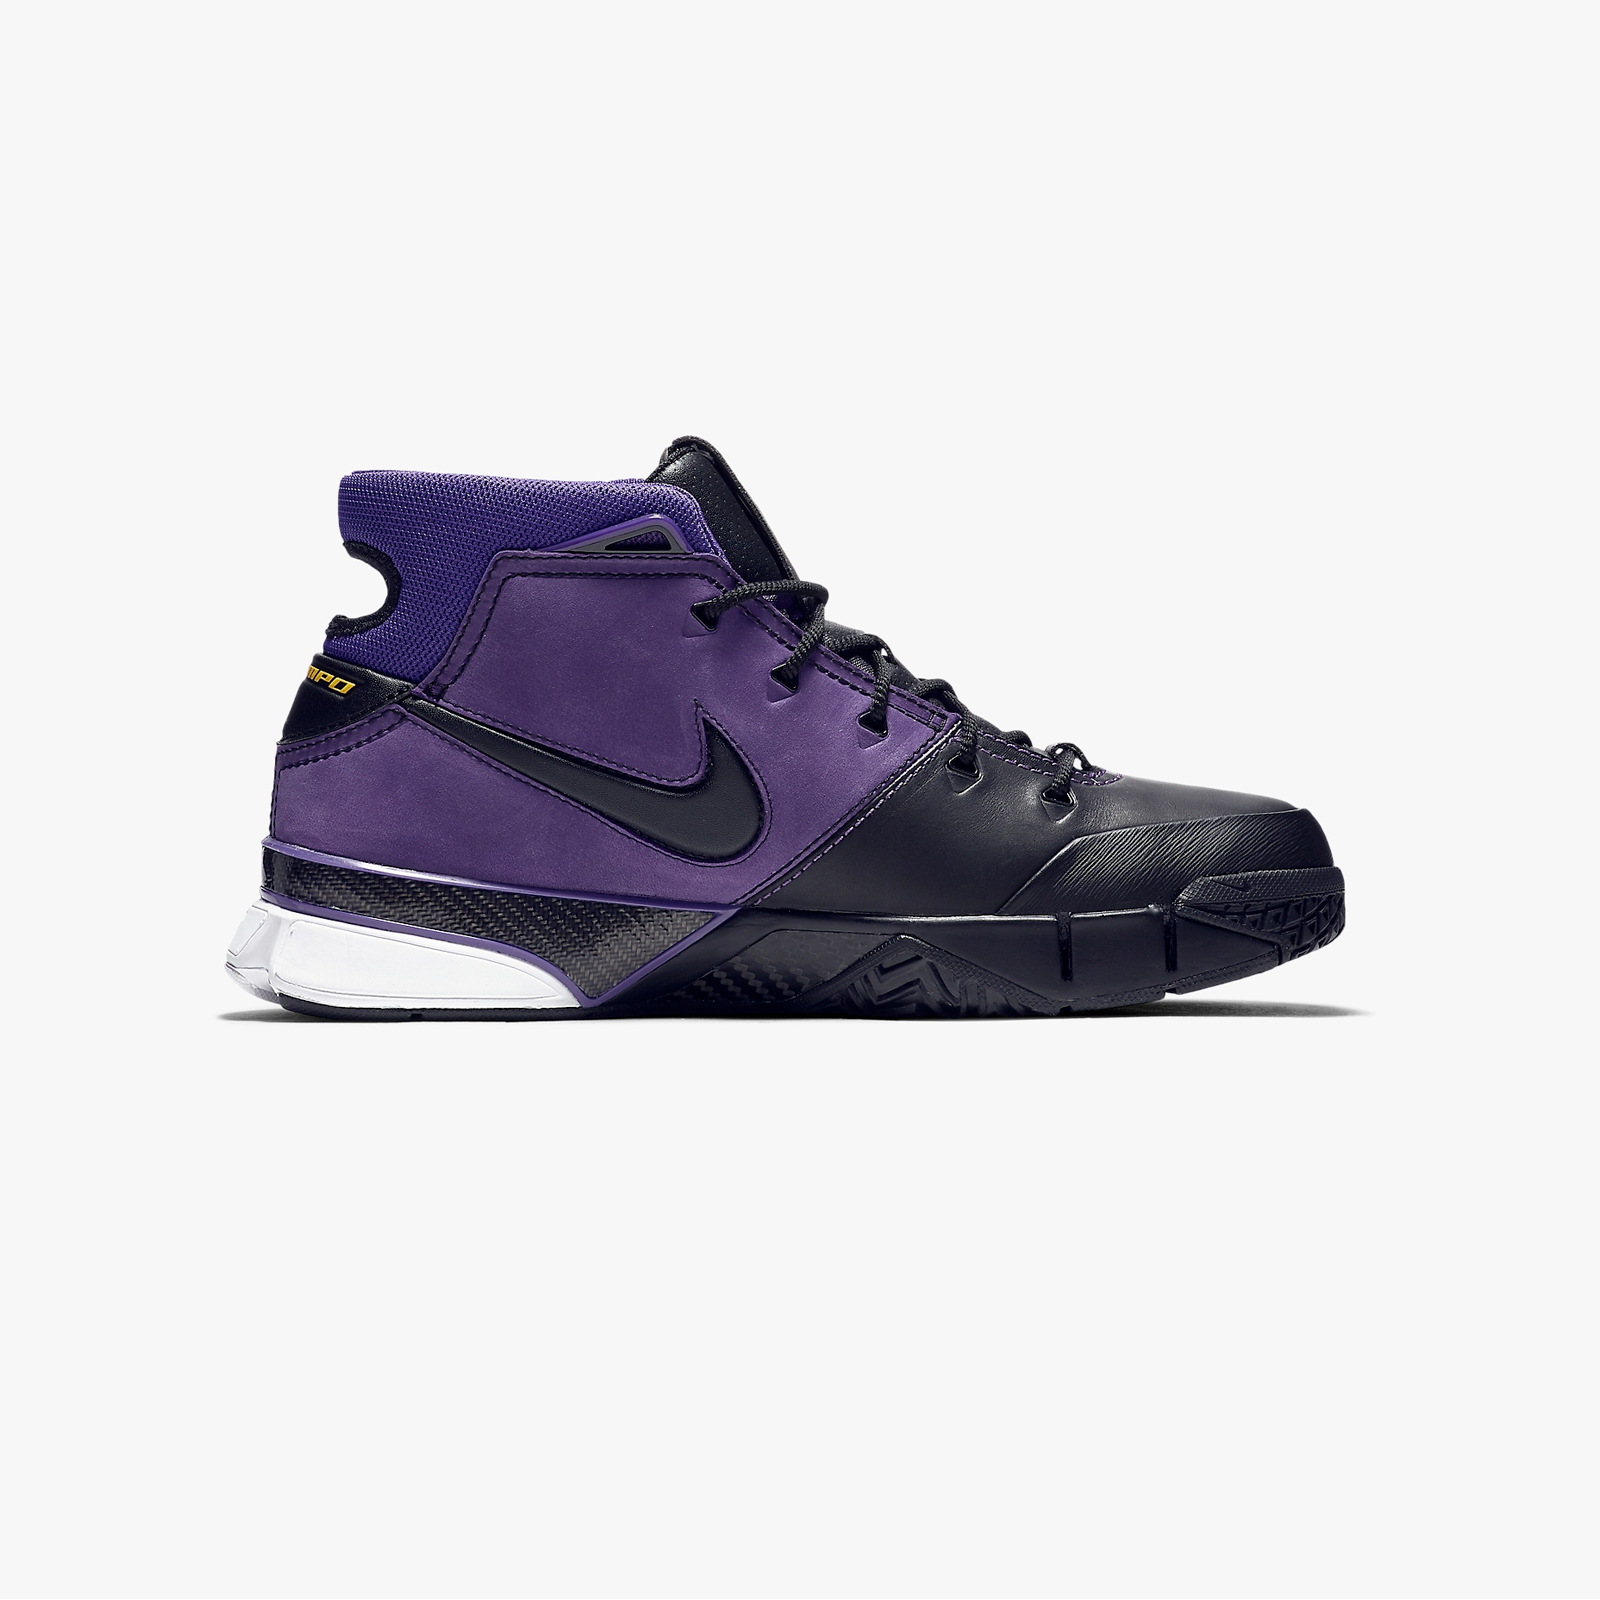 best service 848cf b3162 Nike Basketball Kobe 1 Protro - 8. Close. Previous